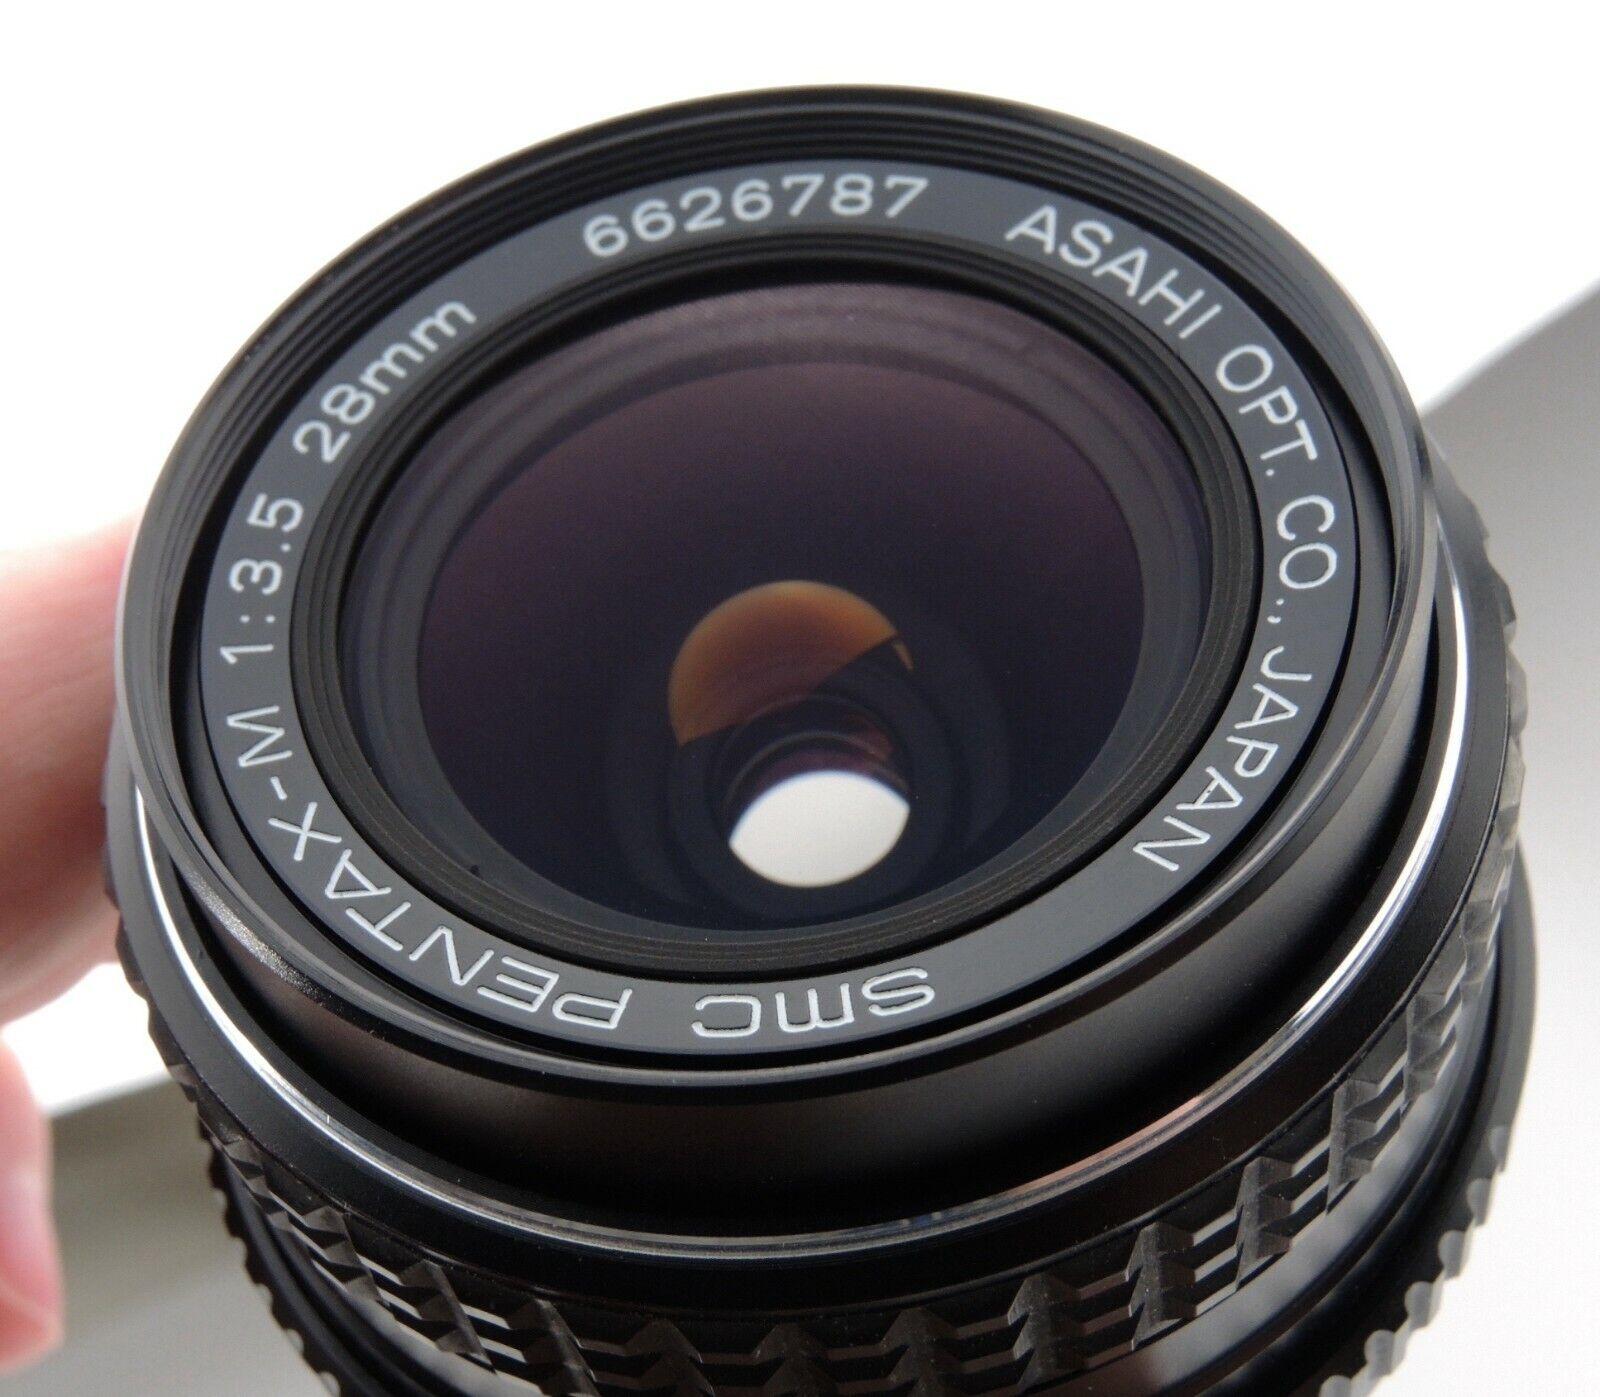 ASAHI PENTAX 28mm F3.5 SMC-M SMC M LENS / PENTAX K MOUNT PK SUPER CLEAN GLASS - $59.99